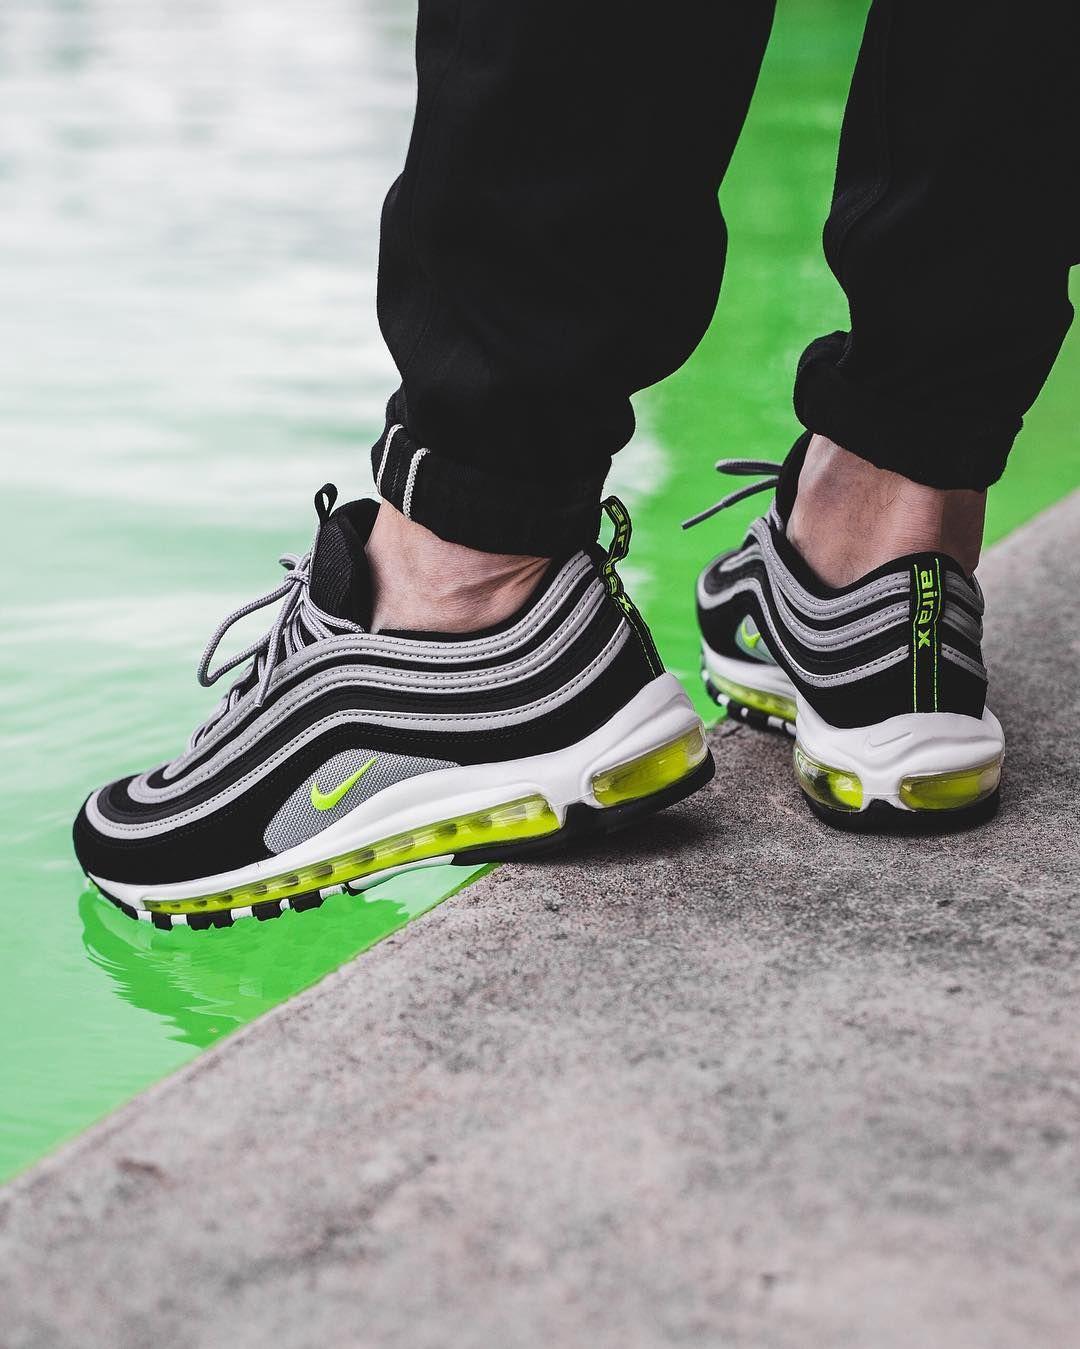 Nike Air Max 97 Japan Og Volt